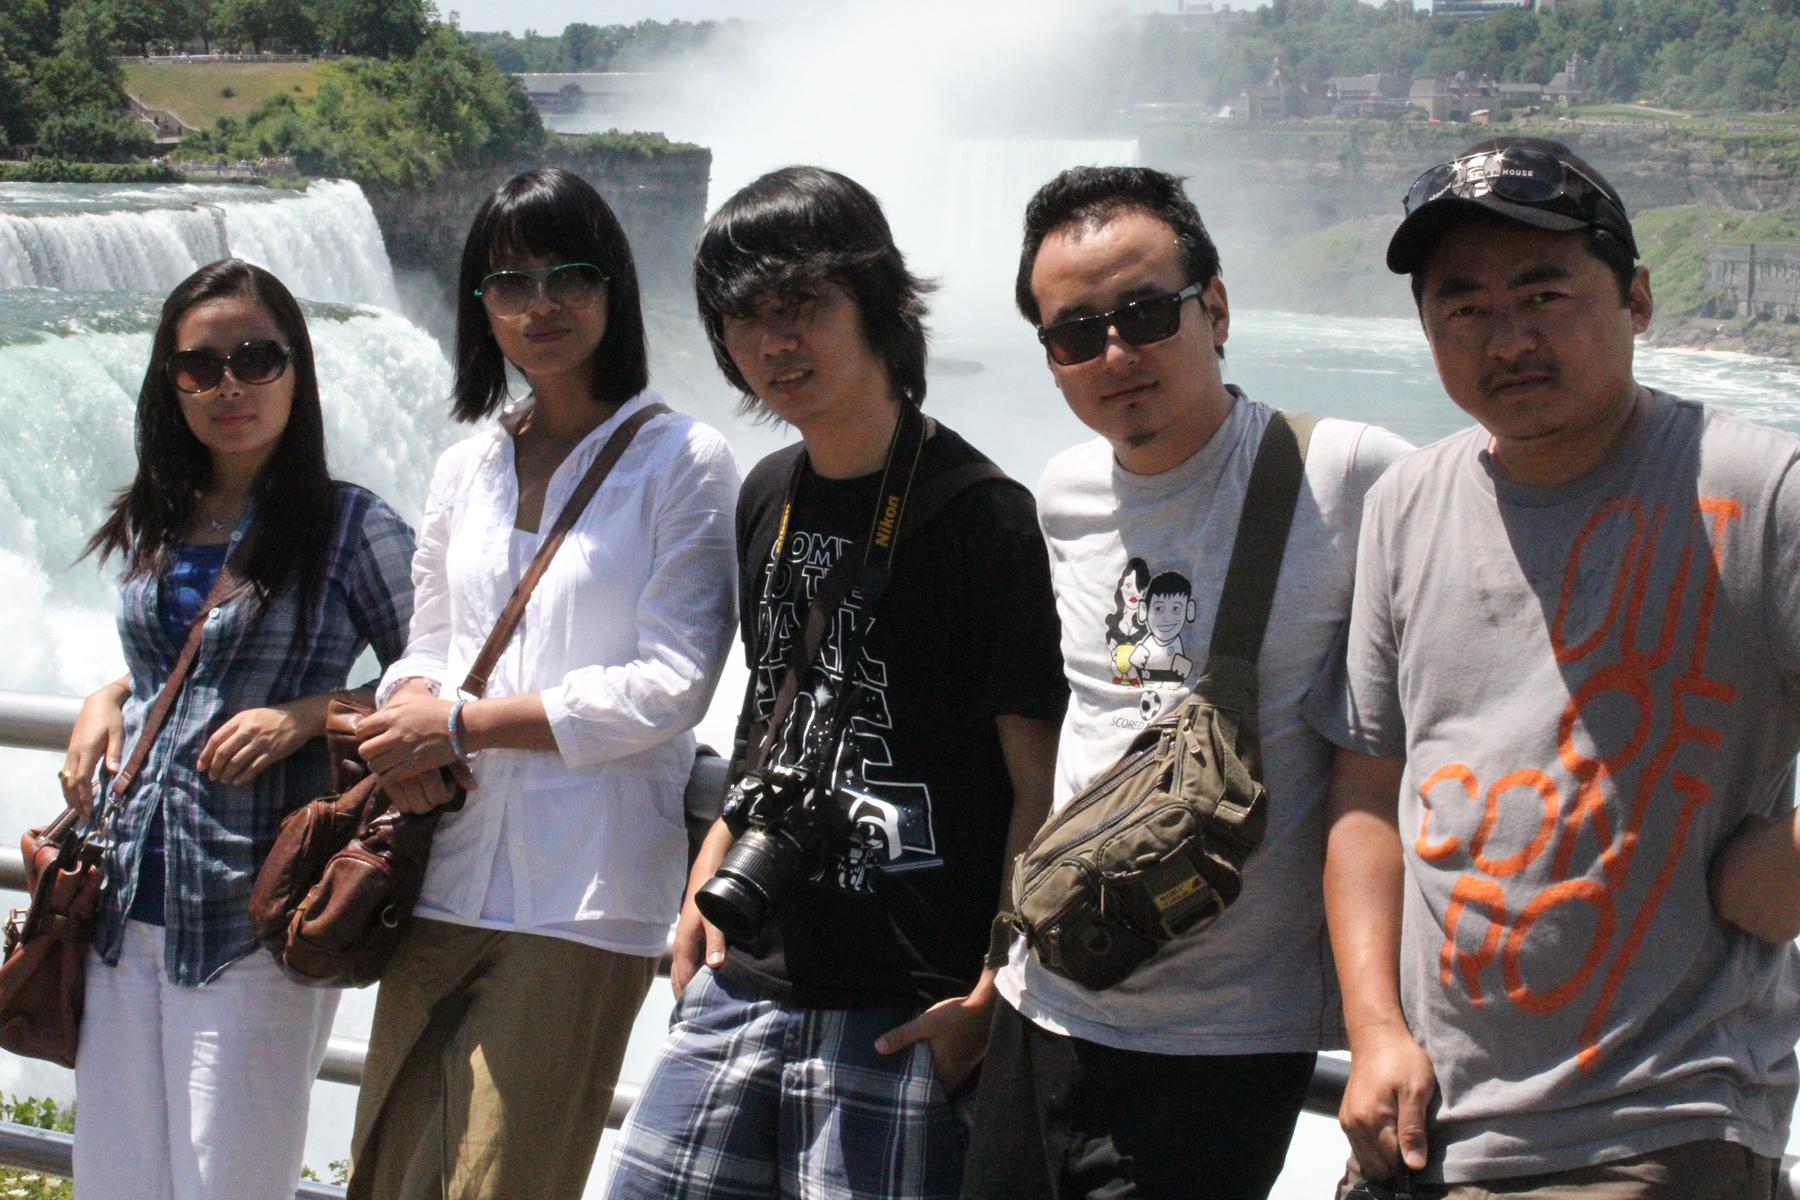 Group_Niagara_6x4.jpg